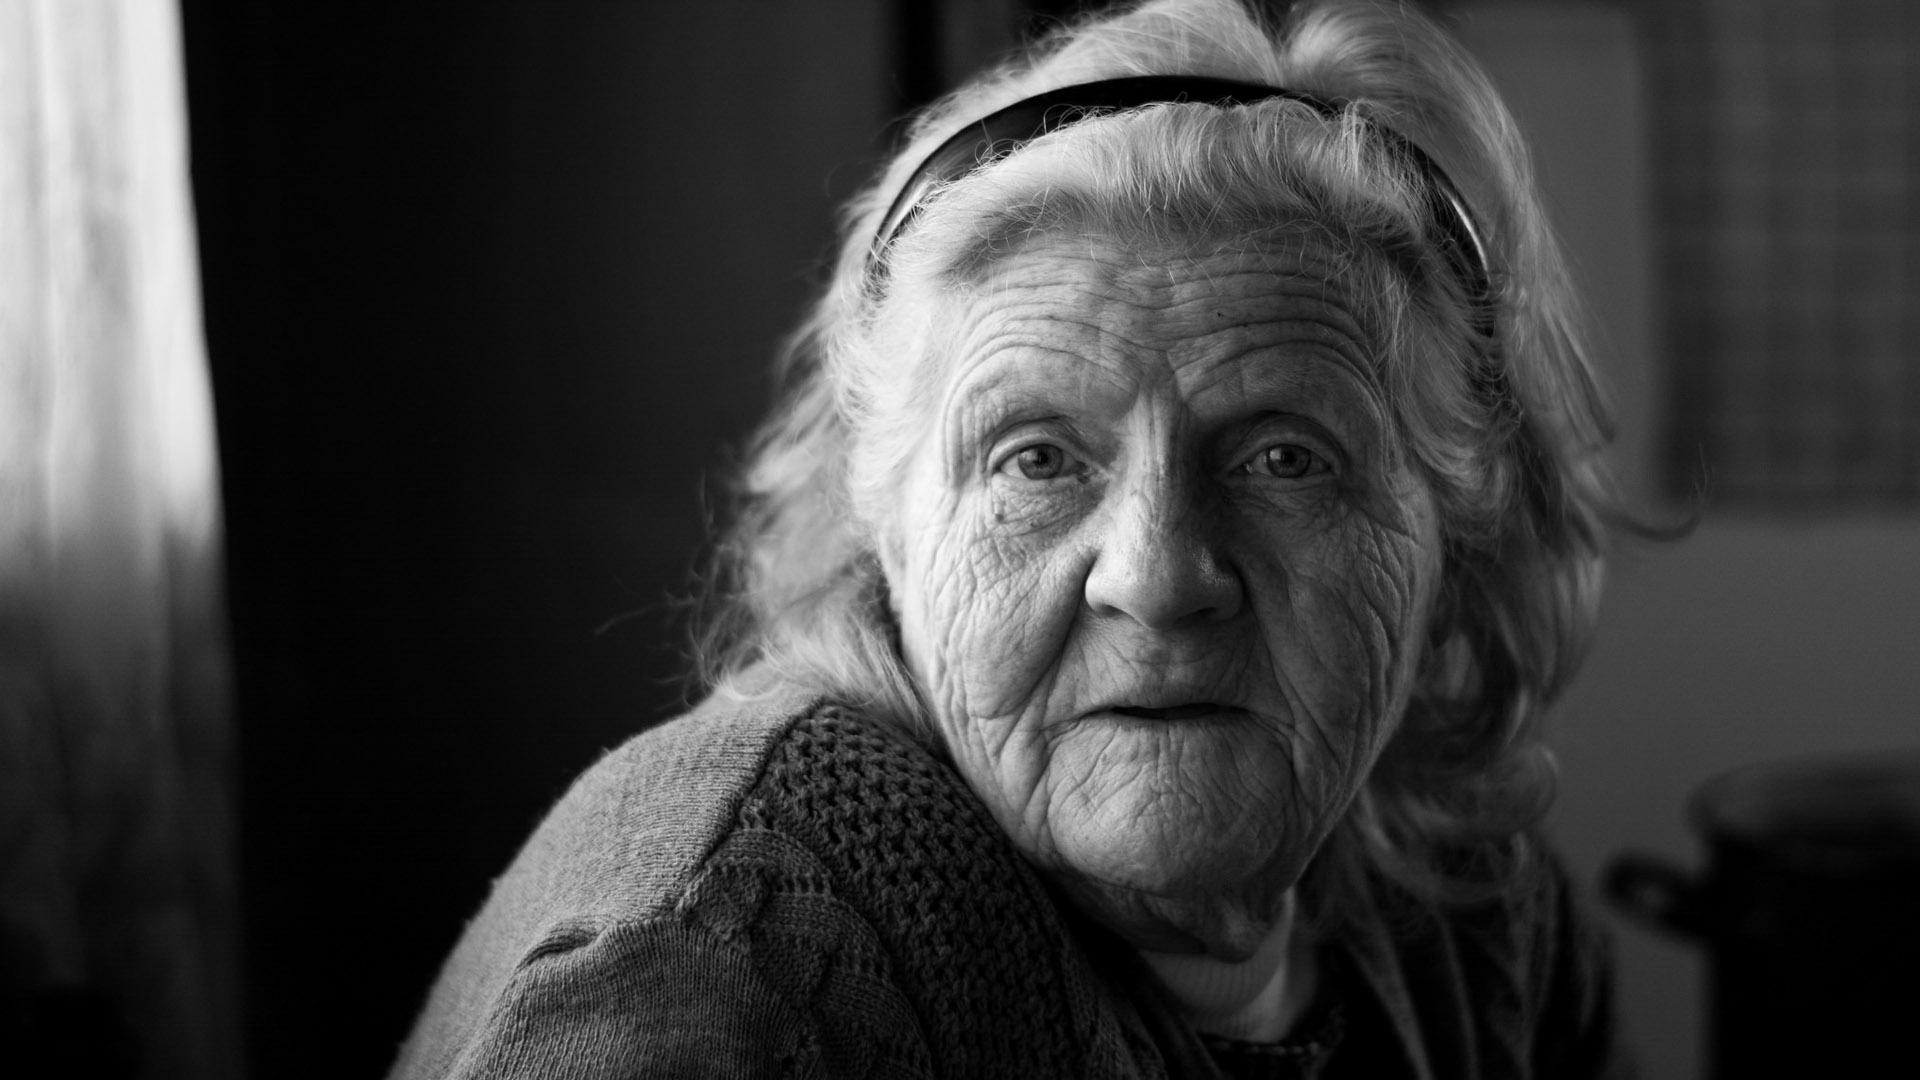 Djordje Krdzic is the Photofocus Photographer of the Day.